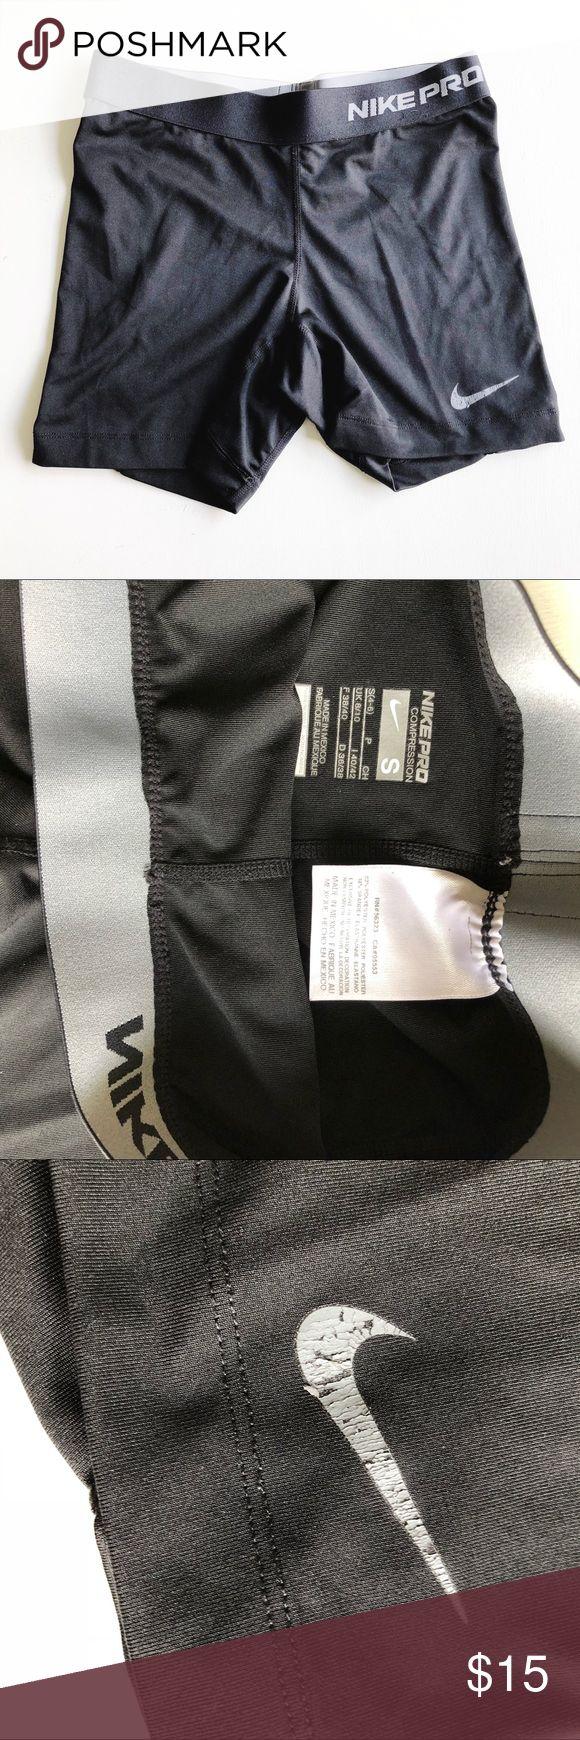 Women's Nike Compression Shorts Black Women's Nike Compression Shorts Black. Size small. Good condition. Nike sign has a little bit of peeling. Nike Shorts